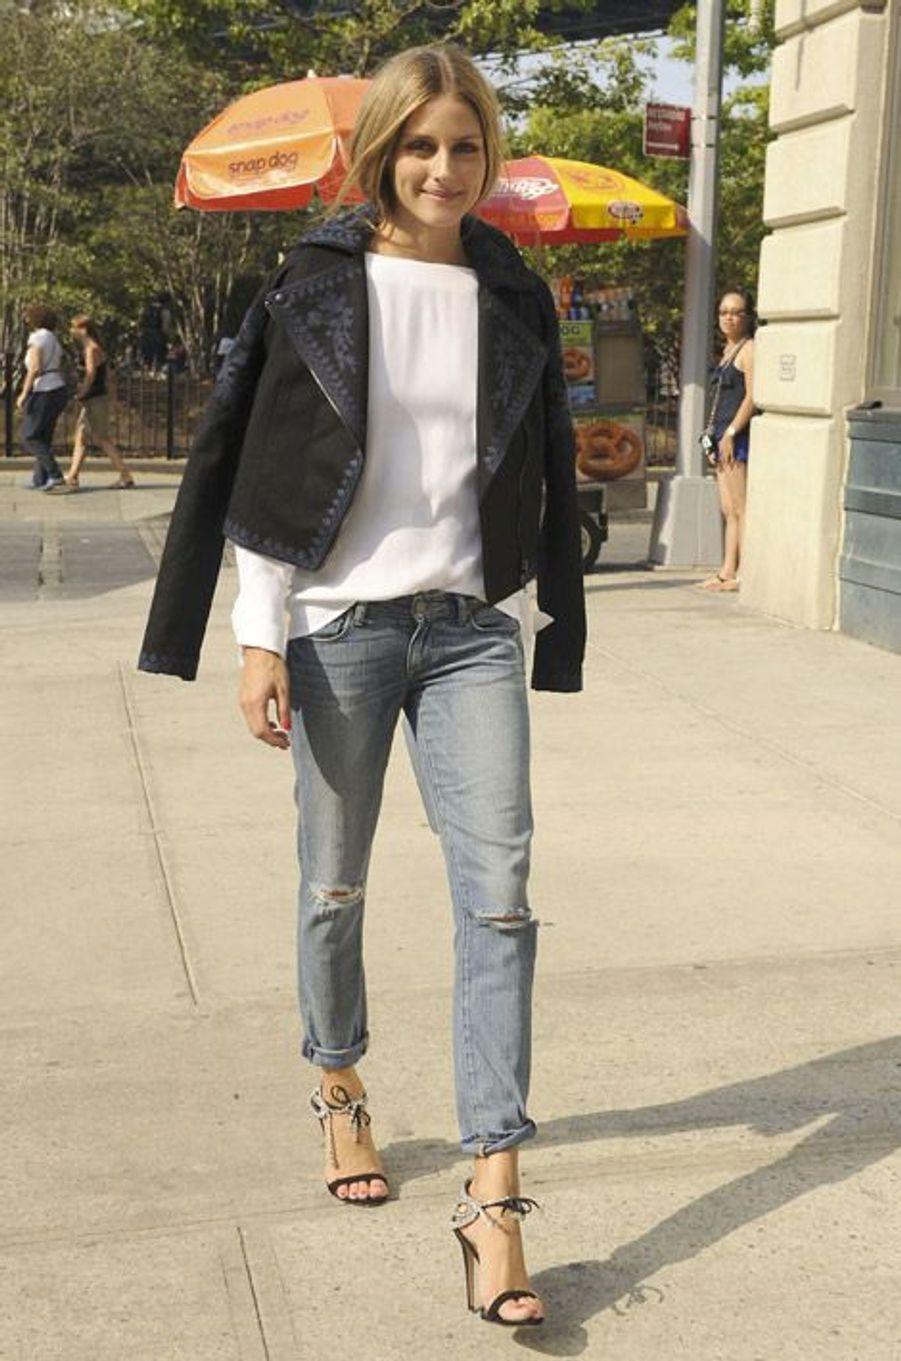 La it-girl Olivia Palermo à New York, le 24 août 2014